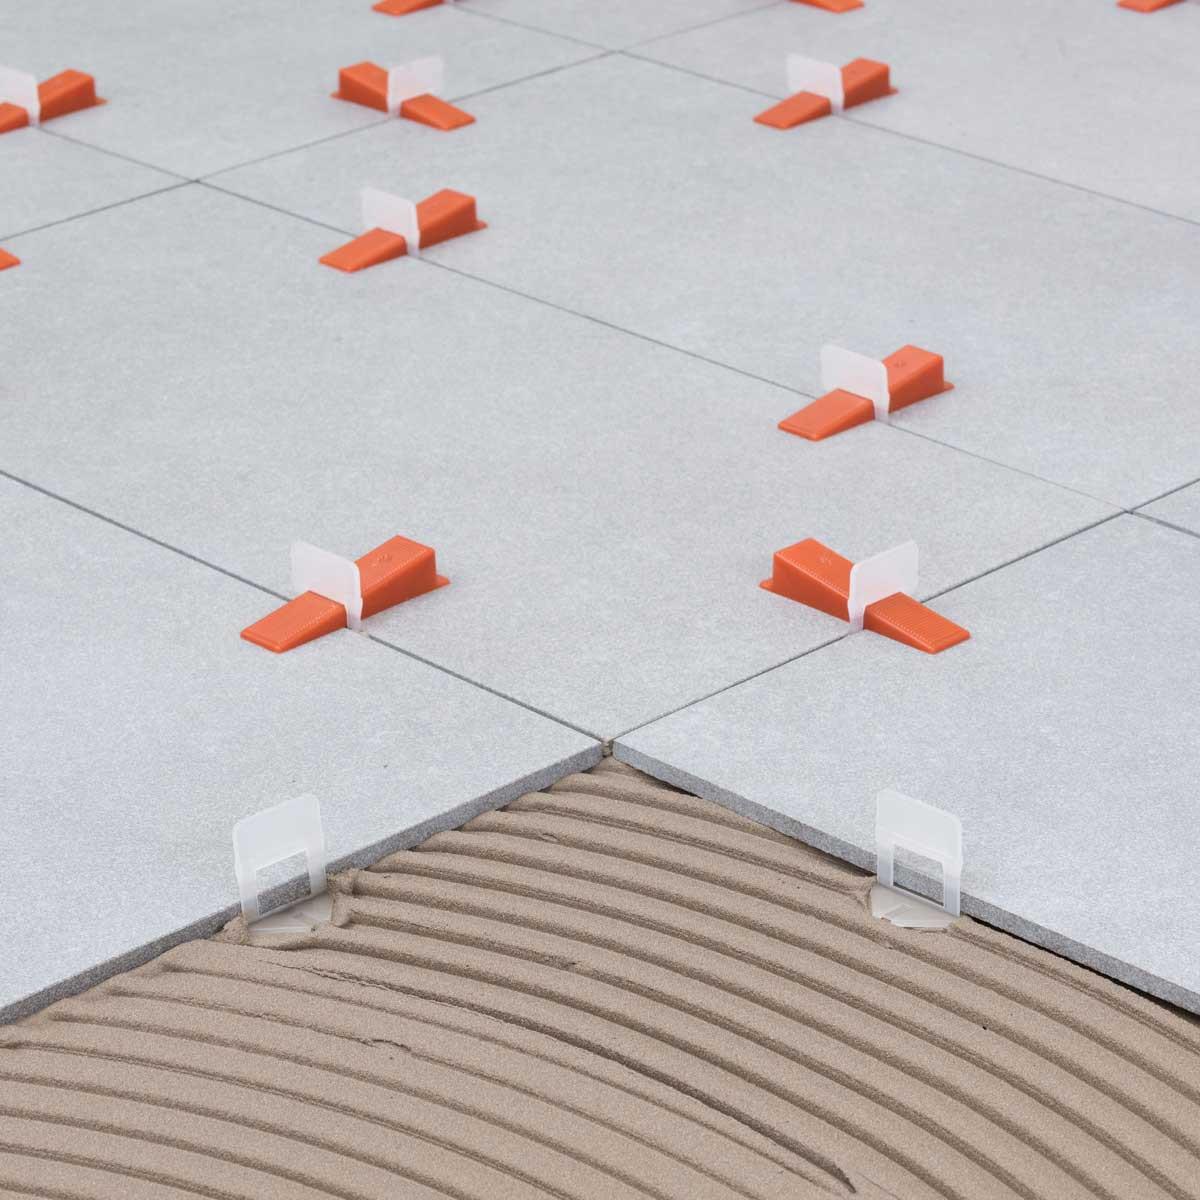 Raimondi RLS floor leveling system wedge and strips lippage free floor